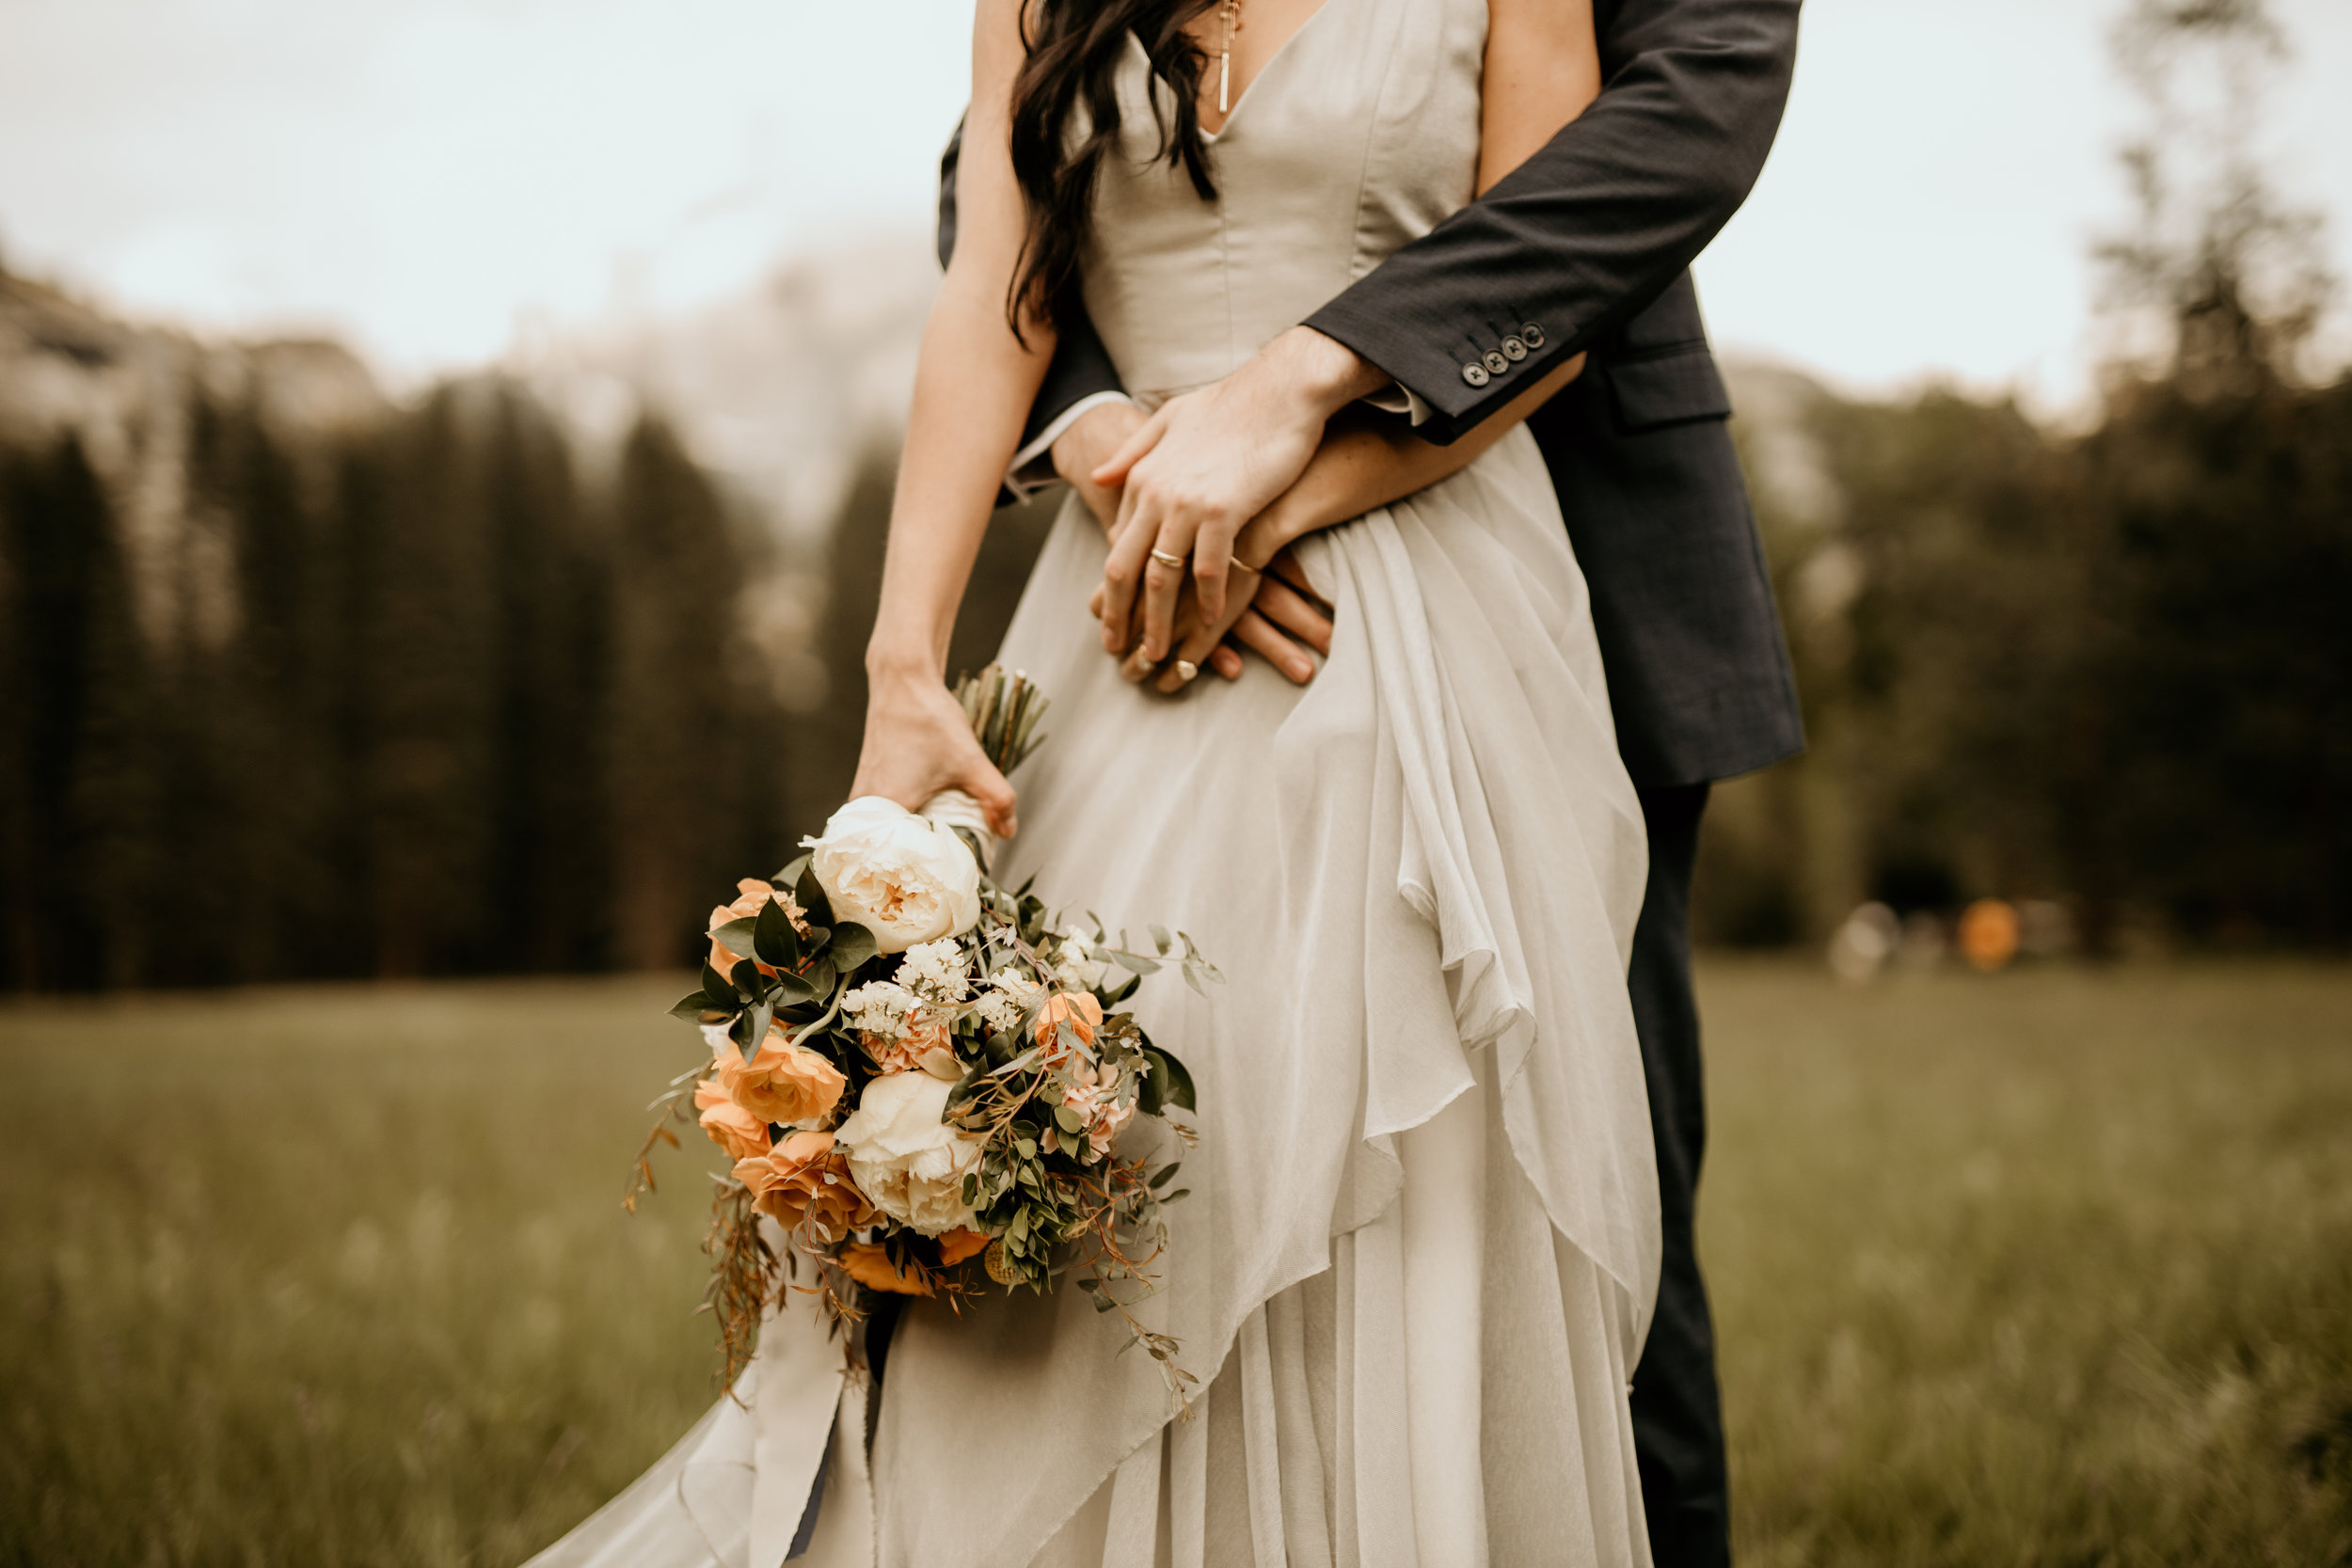 couples-engagement-outdoor-tatoo-photoshoot-little-rock-arkansas-1327.jpg